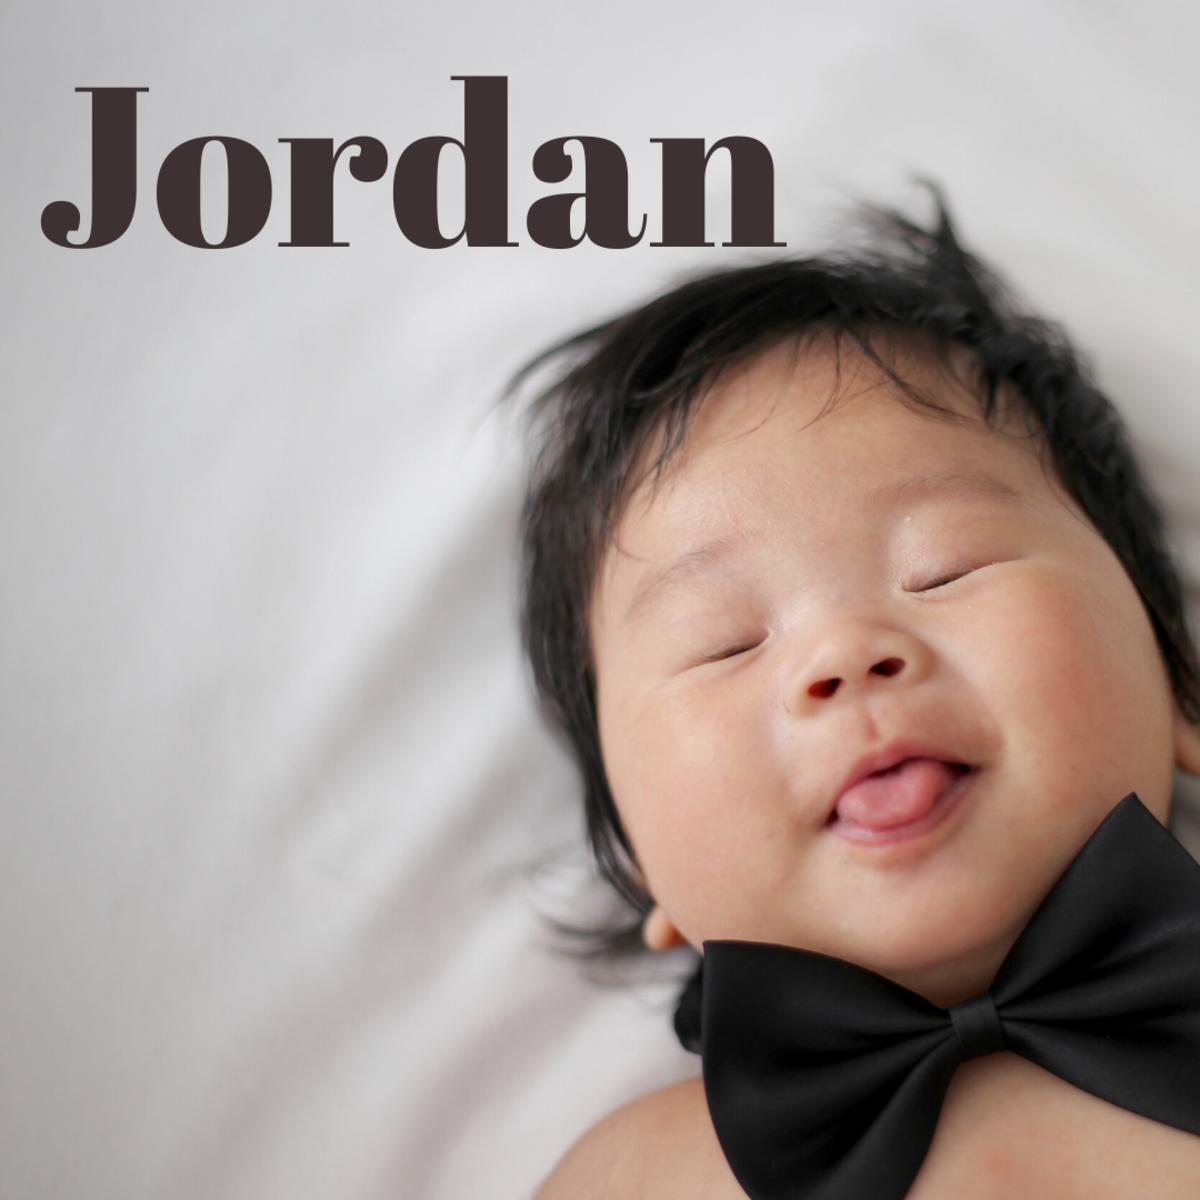 Baby Jordan